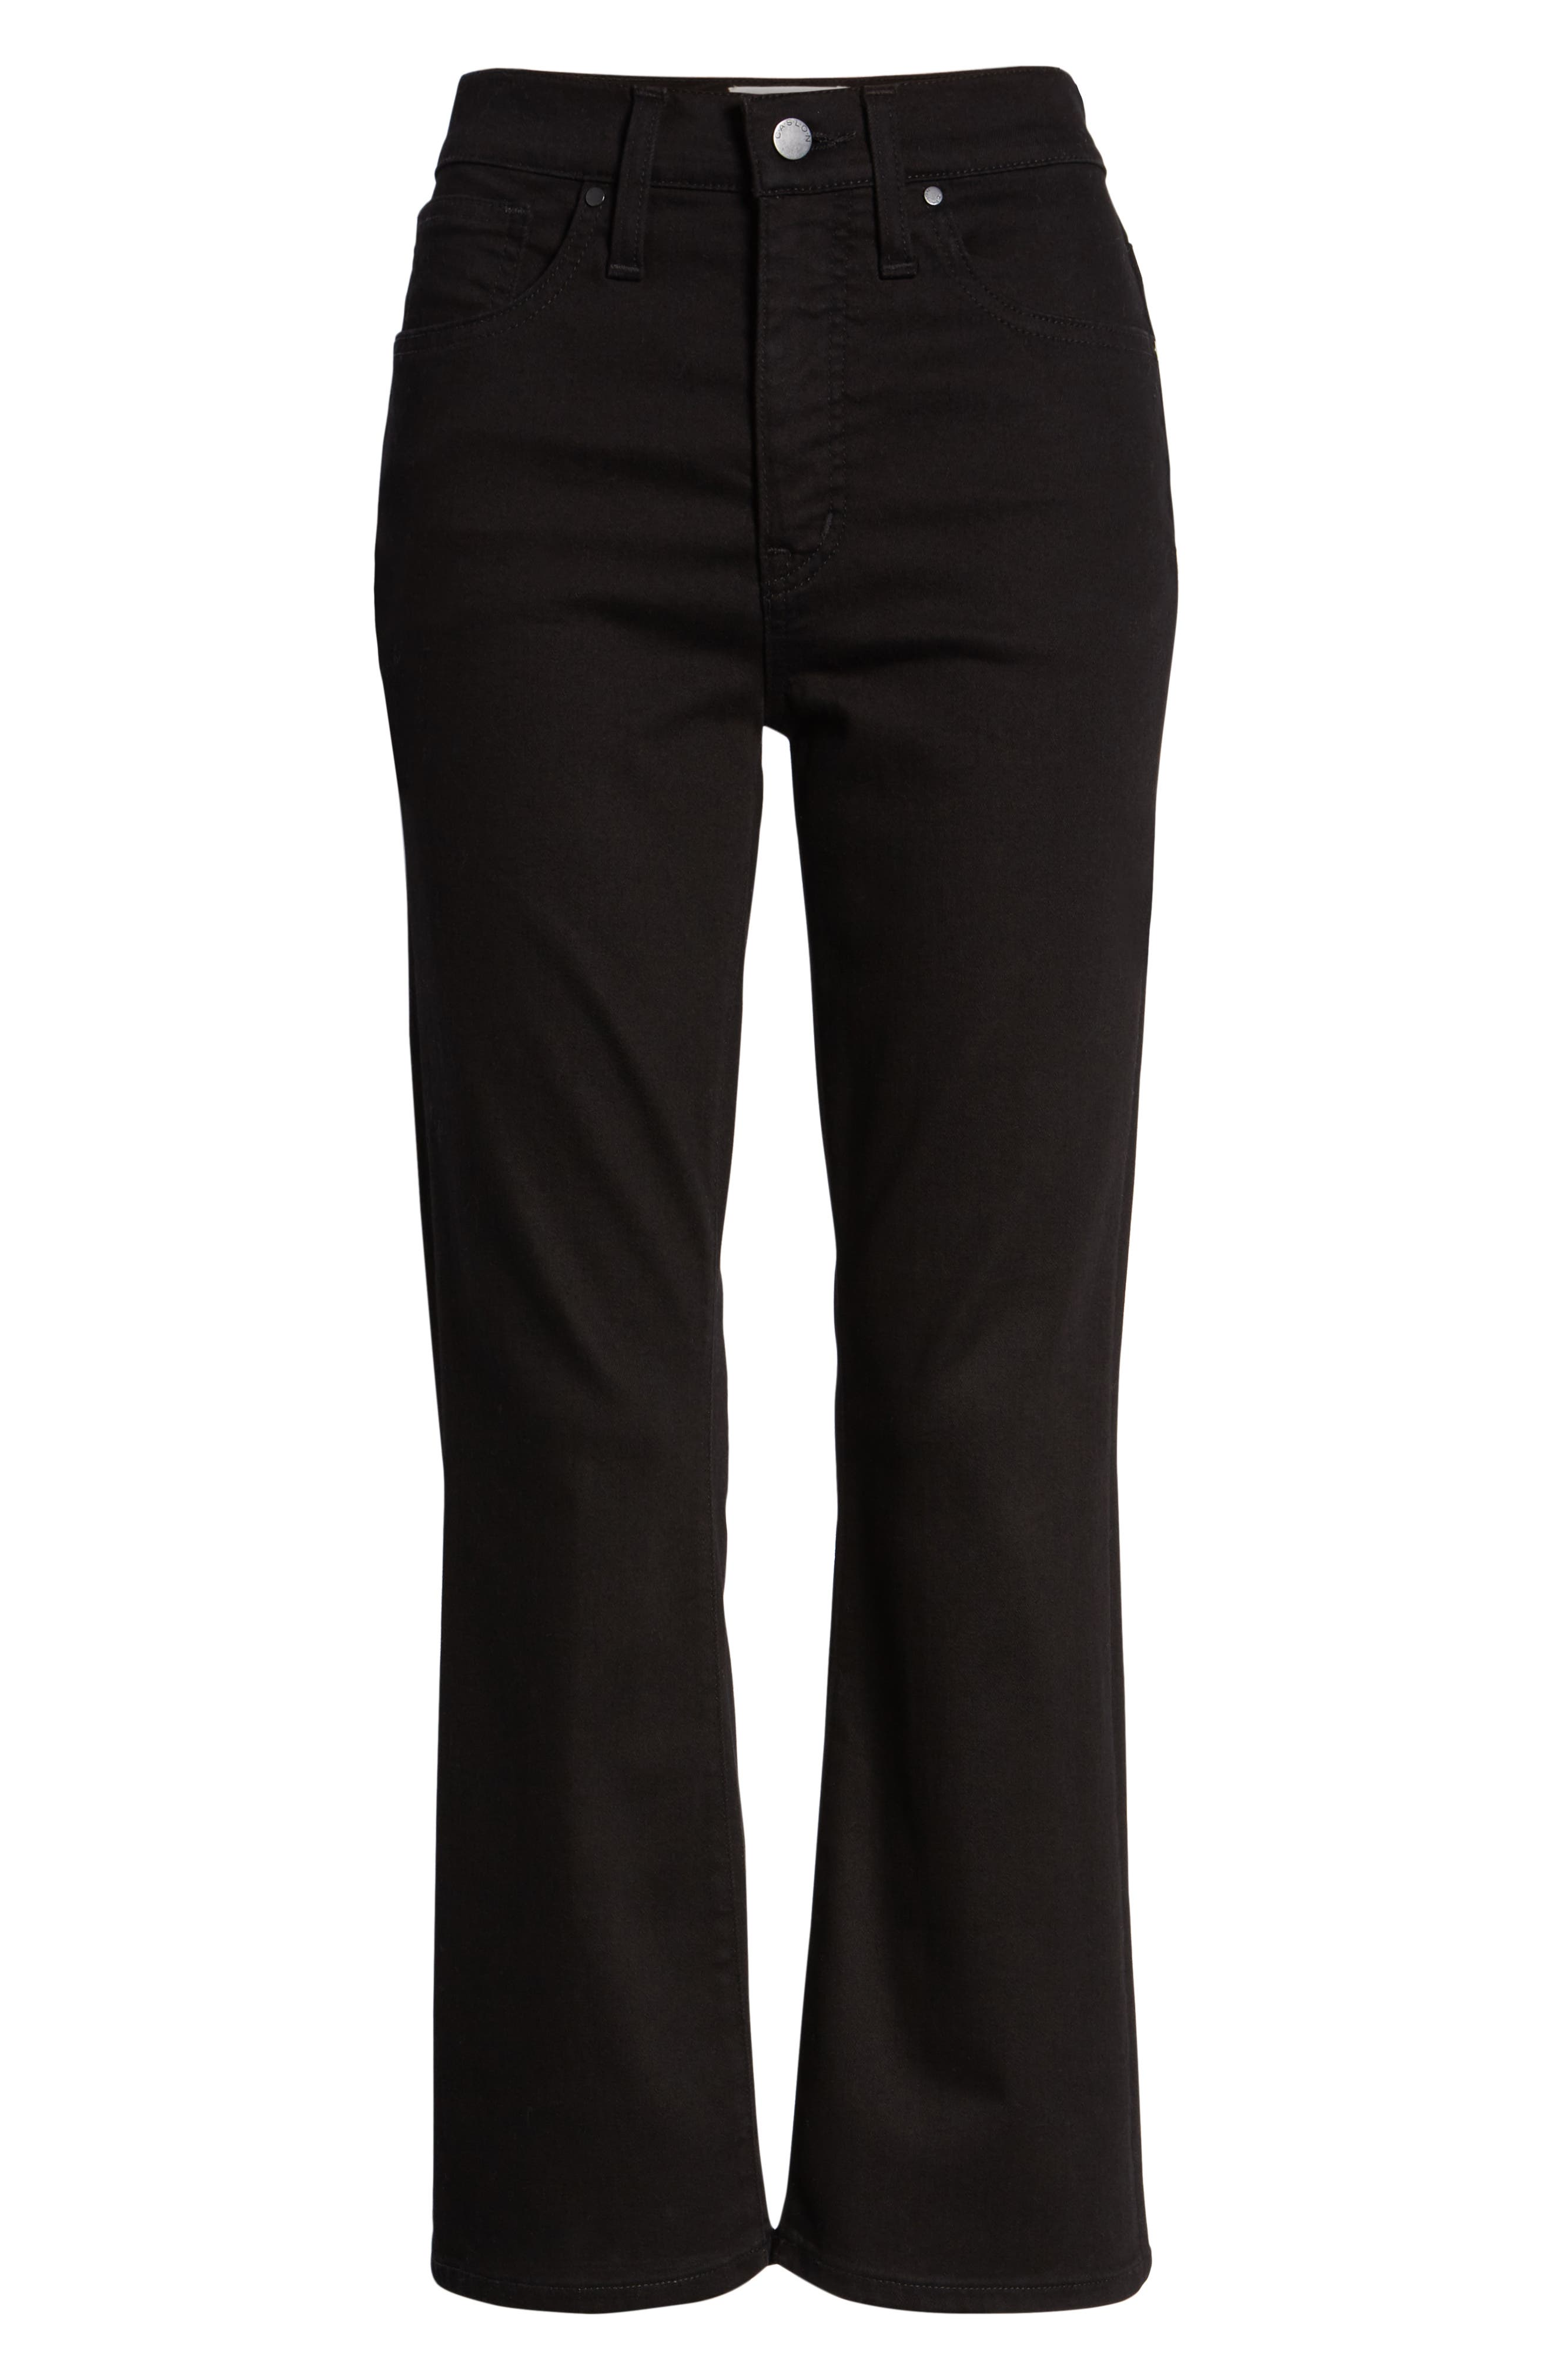 Kick Flare Crop Jeans,                             Alternate thumbnail 6, color,                             BLACK